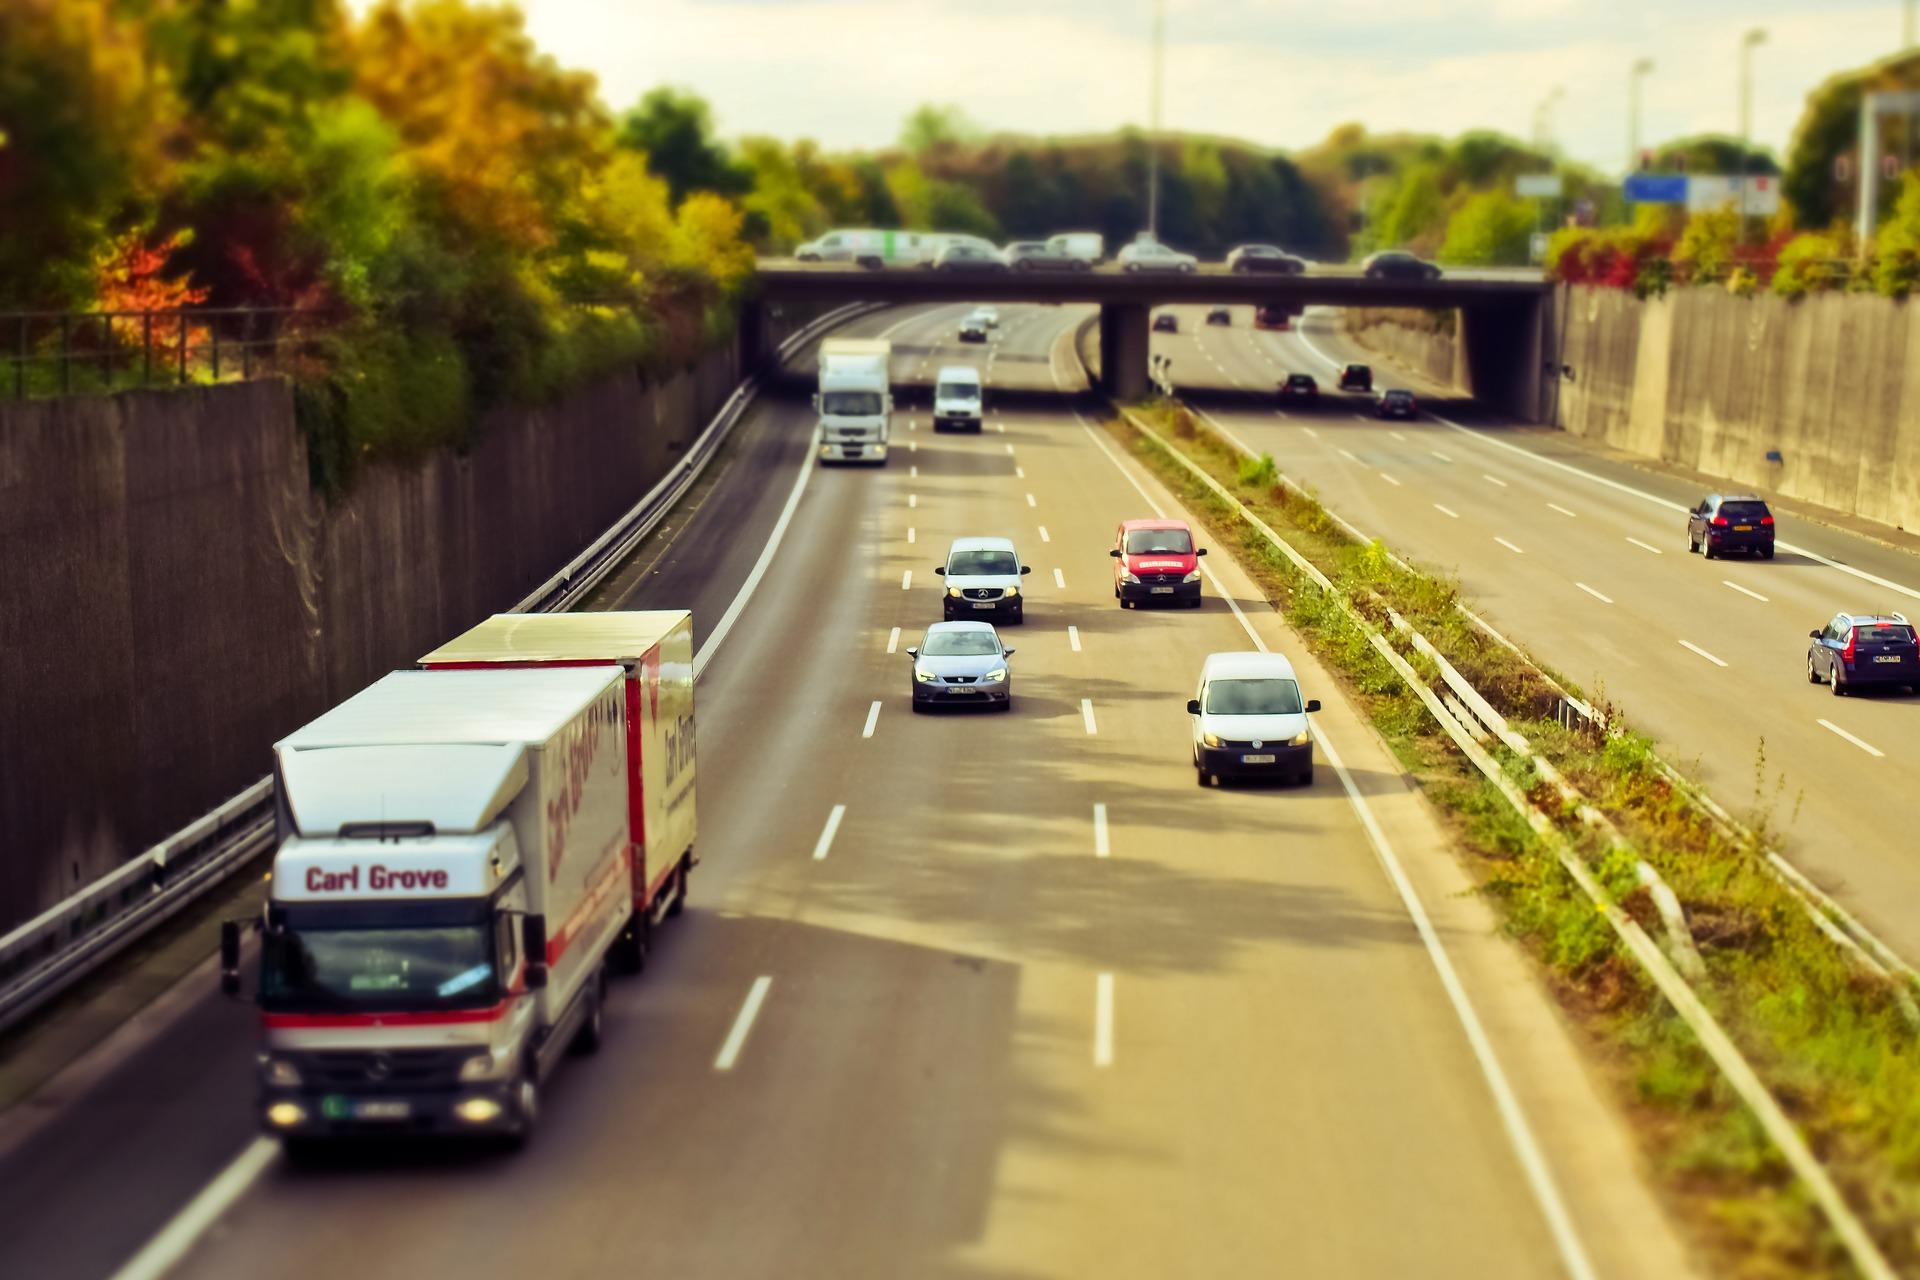 wal-mar usługi transportowe